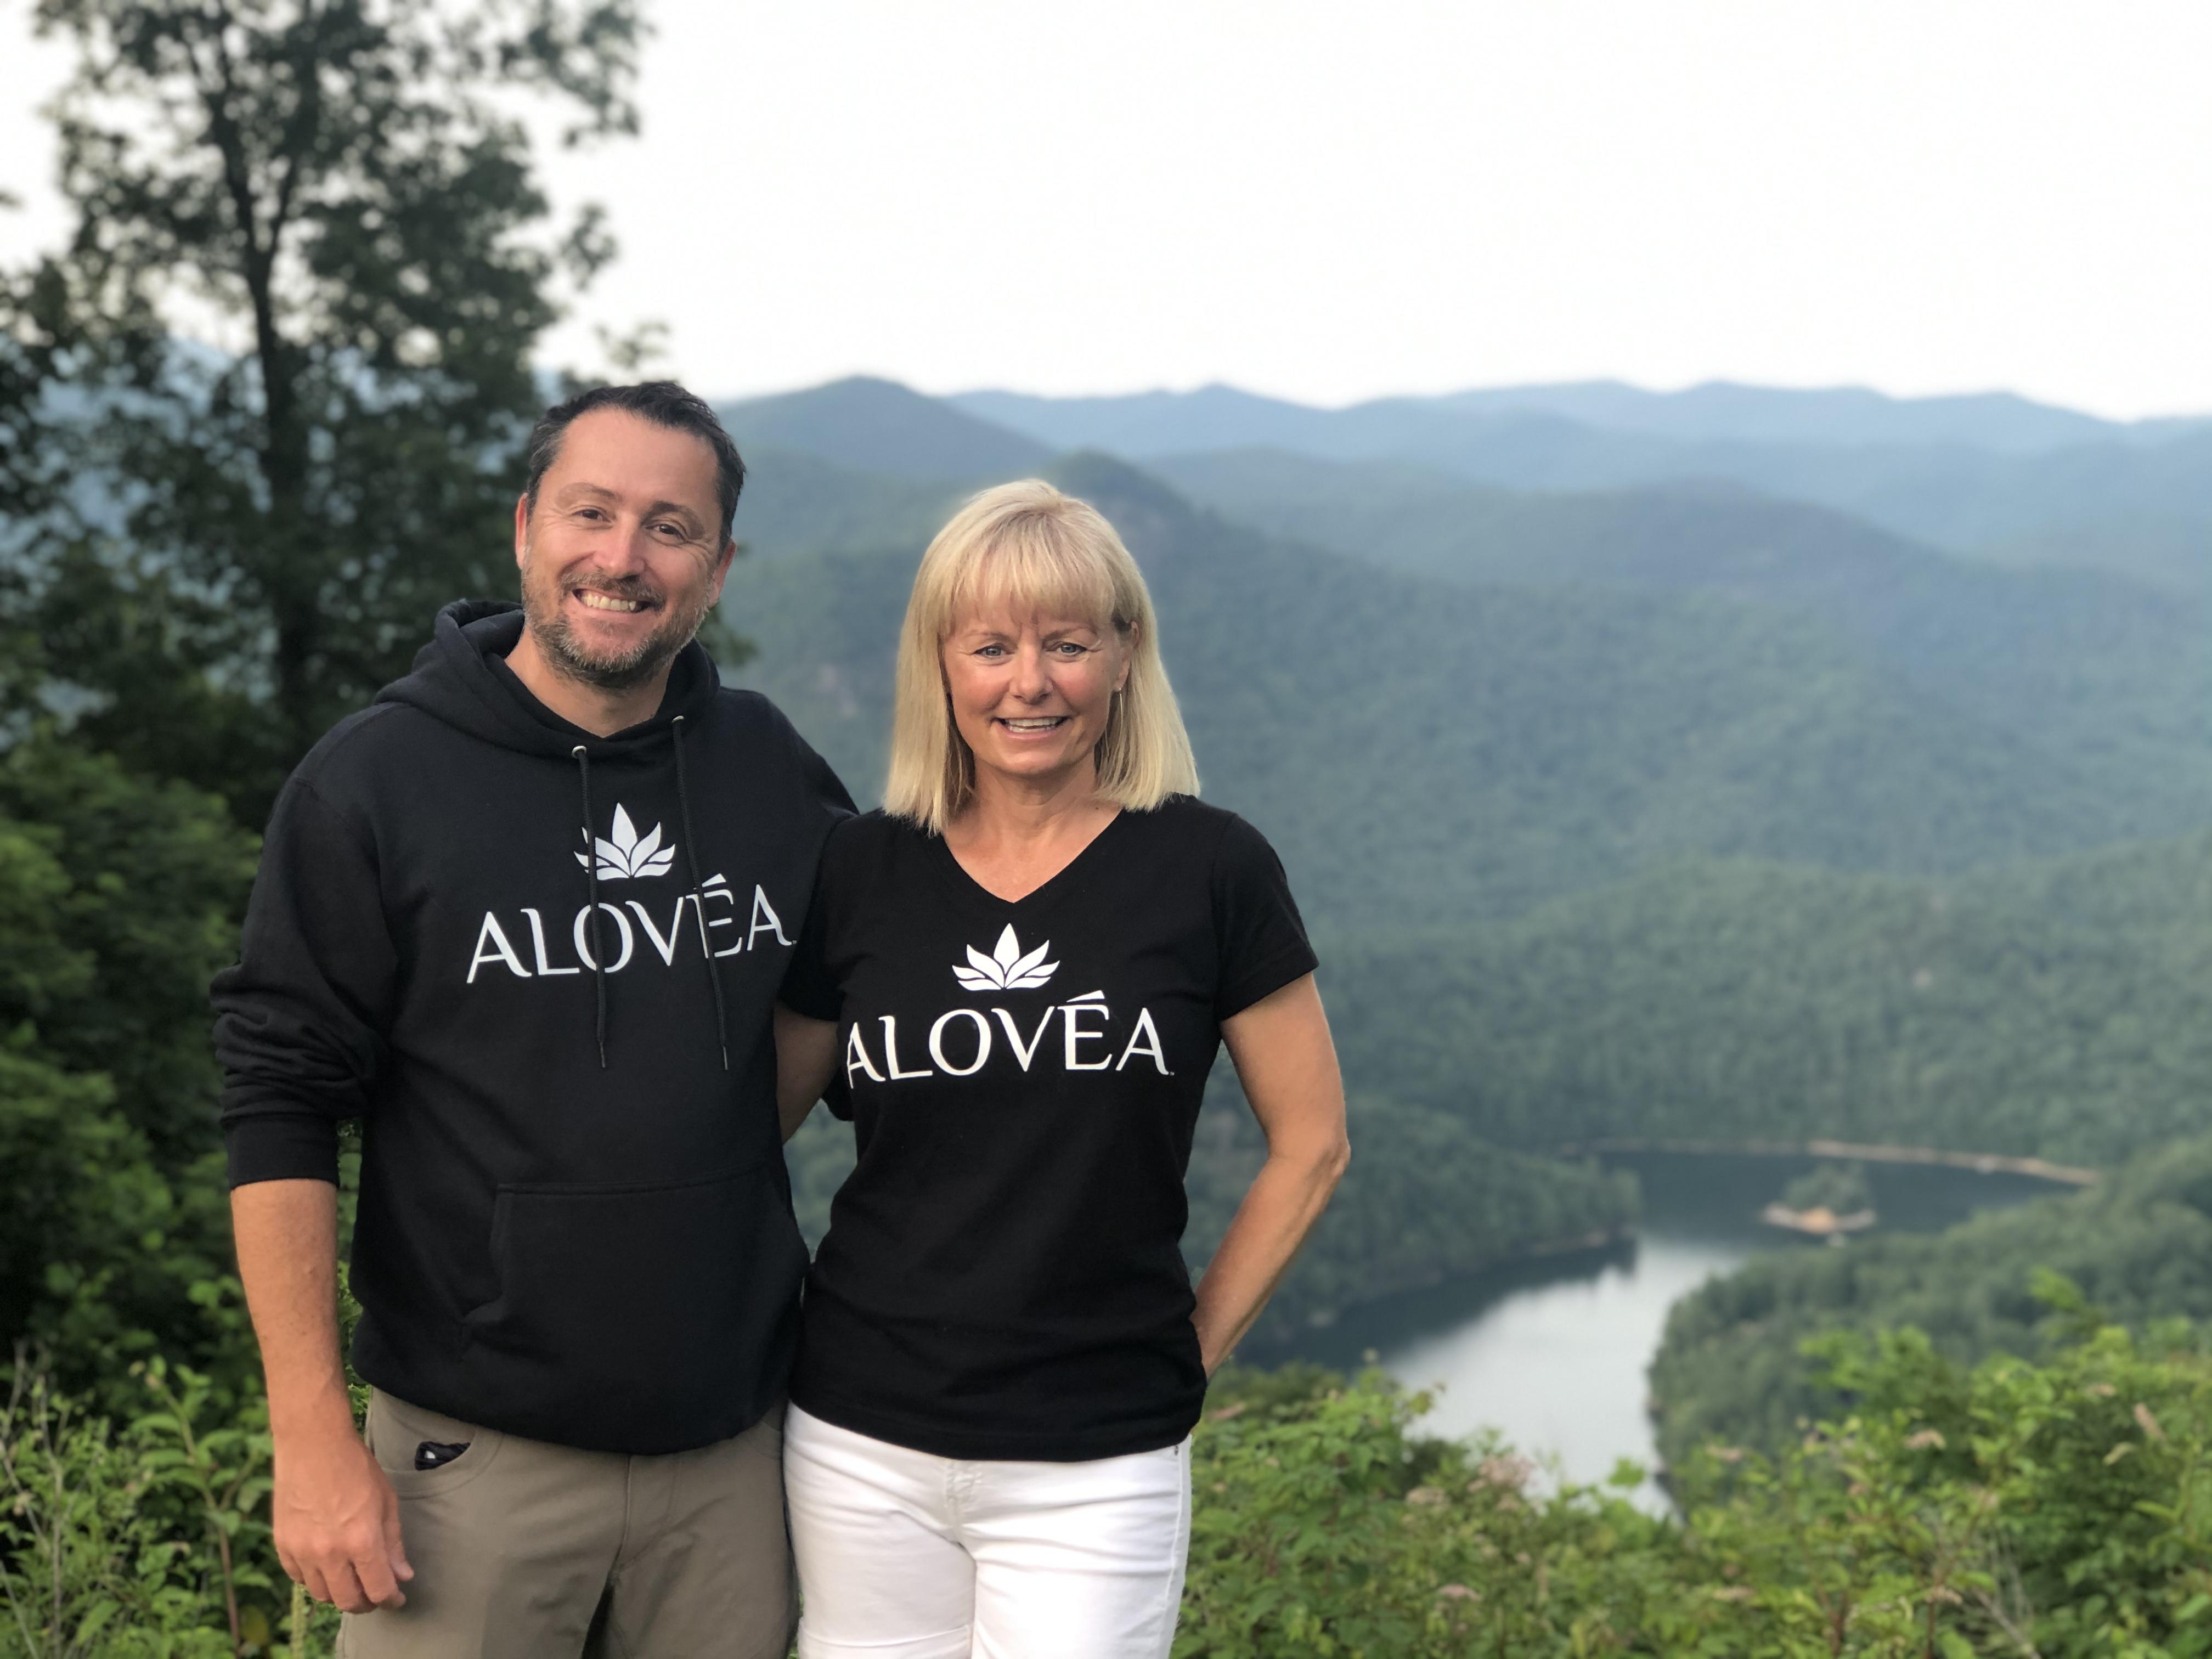 Power Couple Craig and Anne Smith on the Revolutionary Social Business called Alovéa